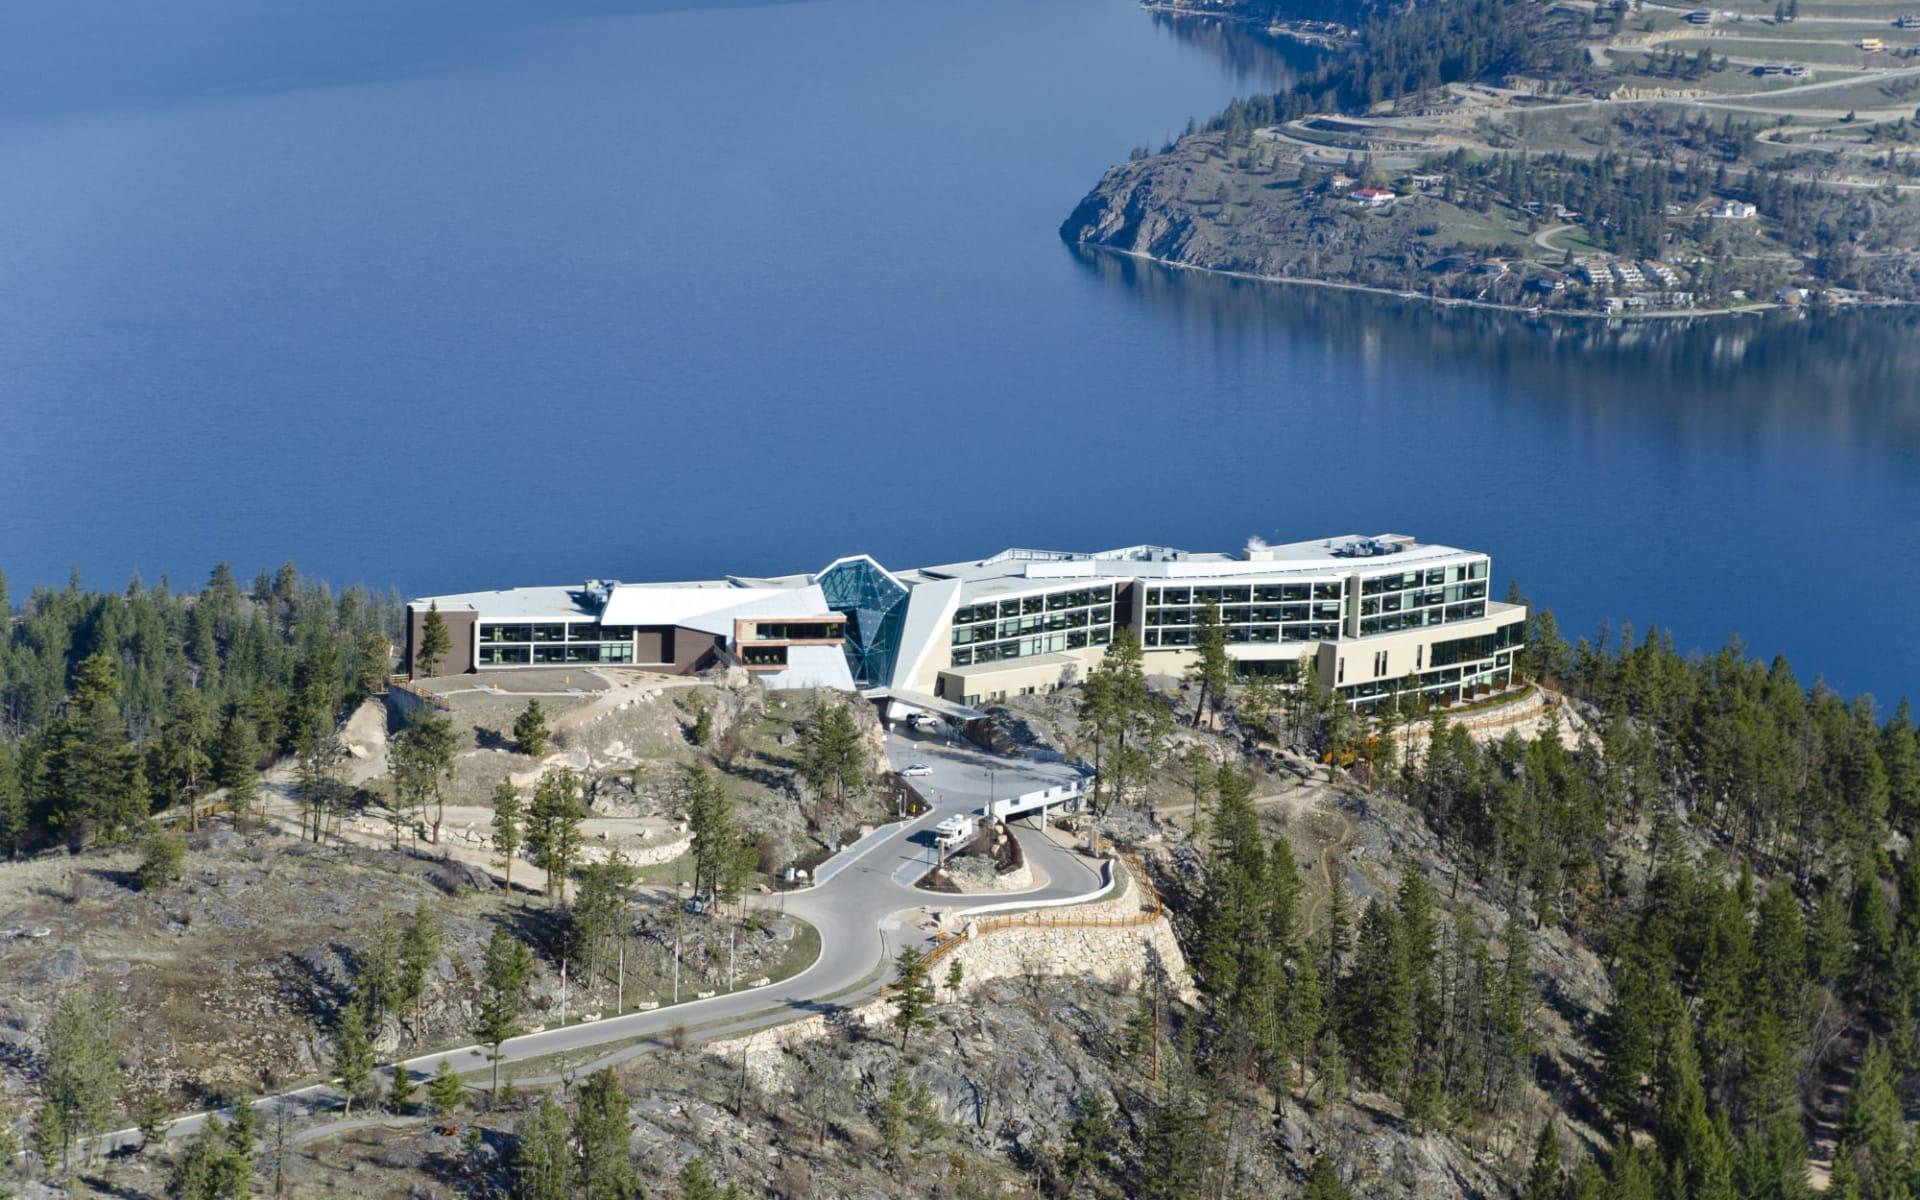 Sparkling Hill Wellness- & Spa Resort in Vernon:  Sparkling Hill Wellness & Spa Resort_AerialLakeView